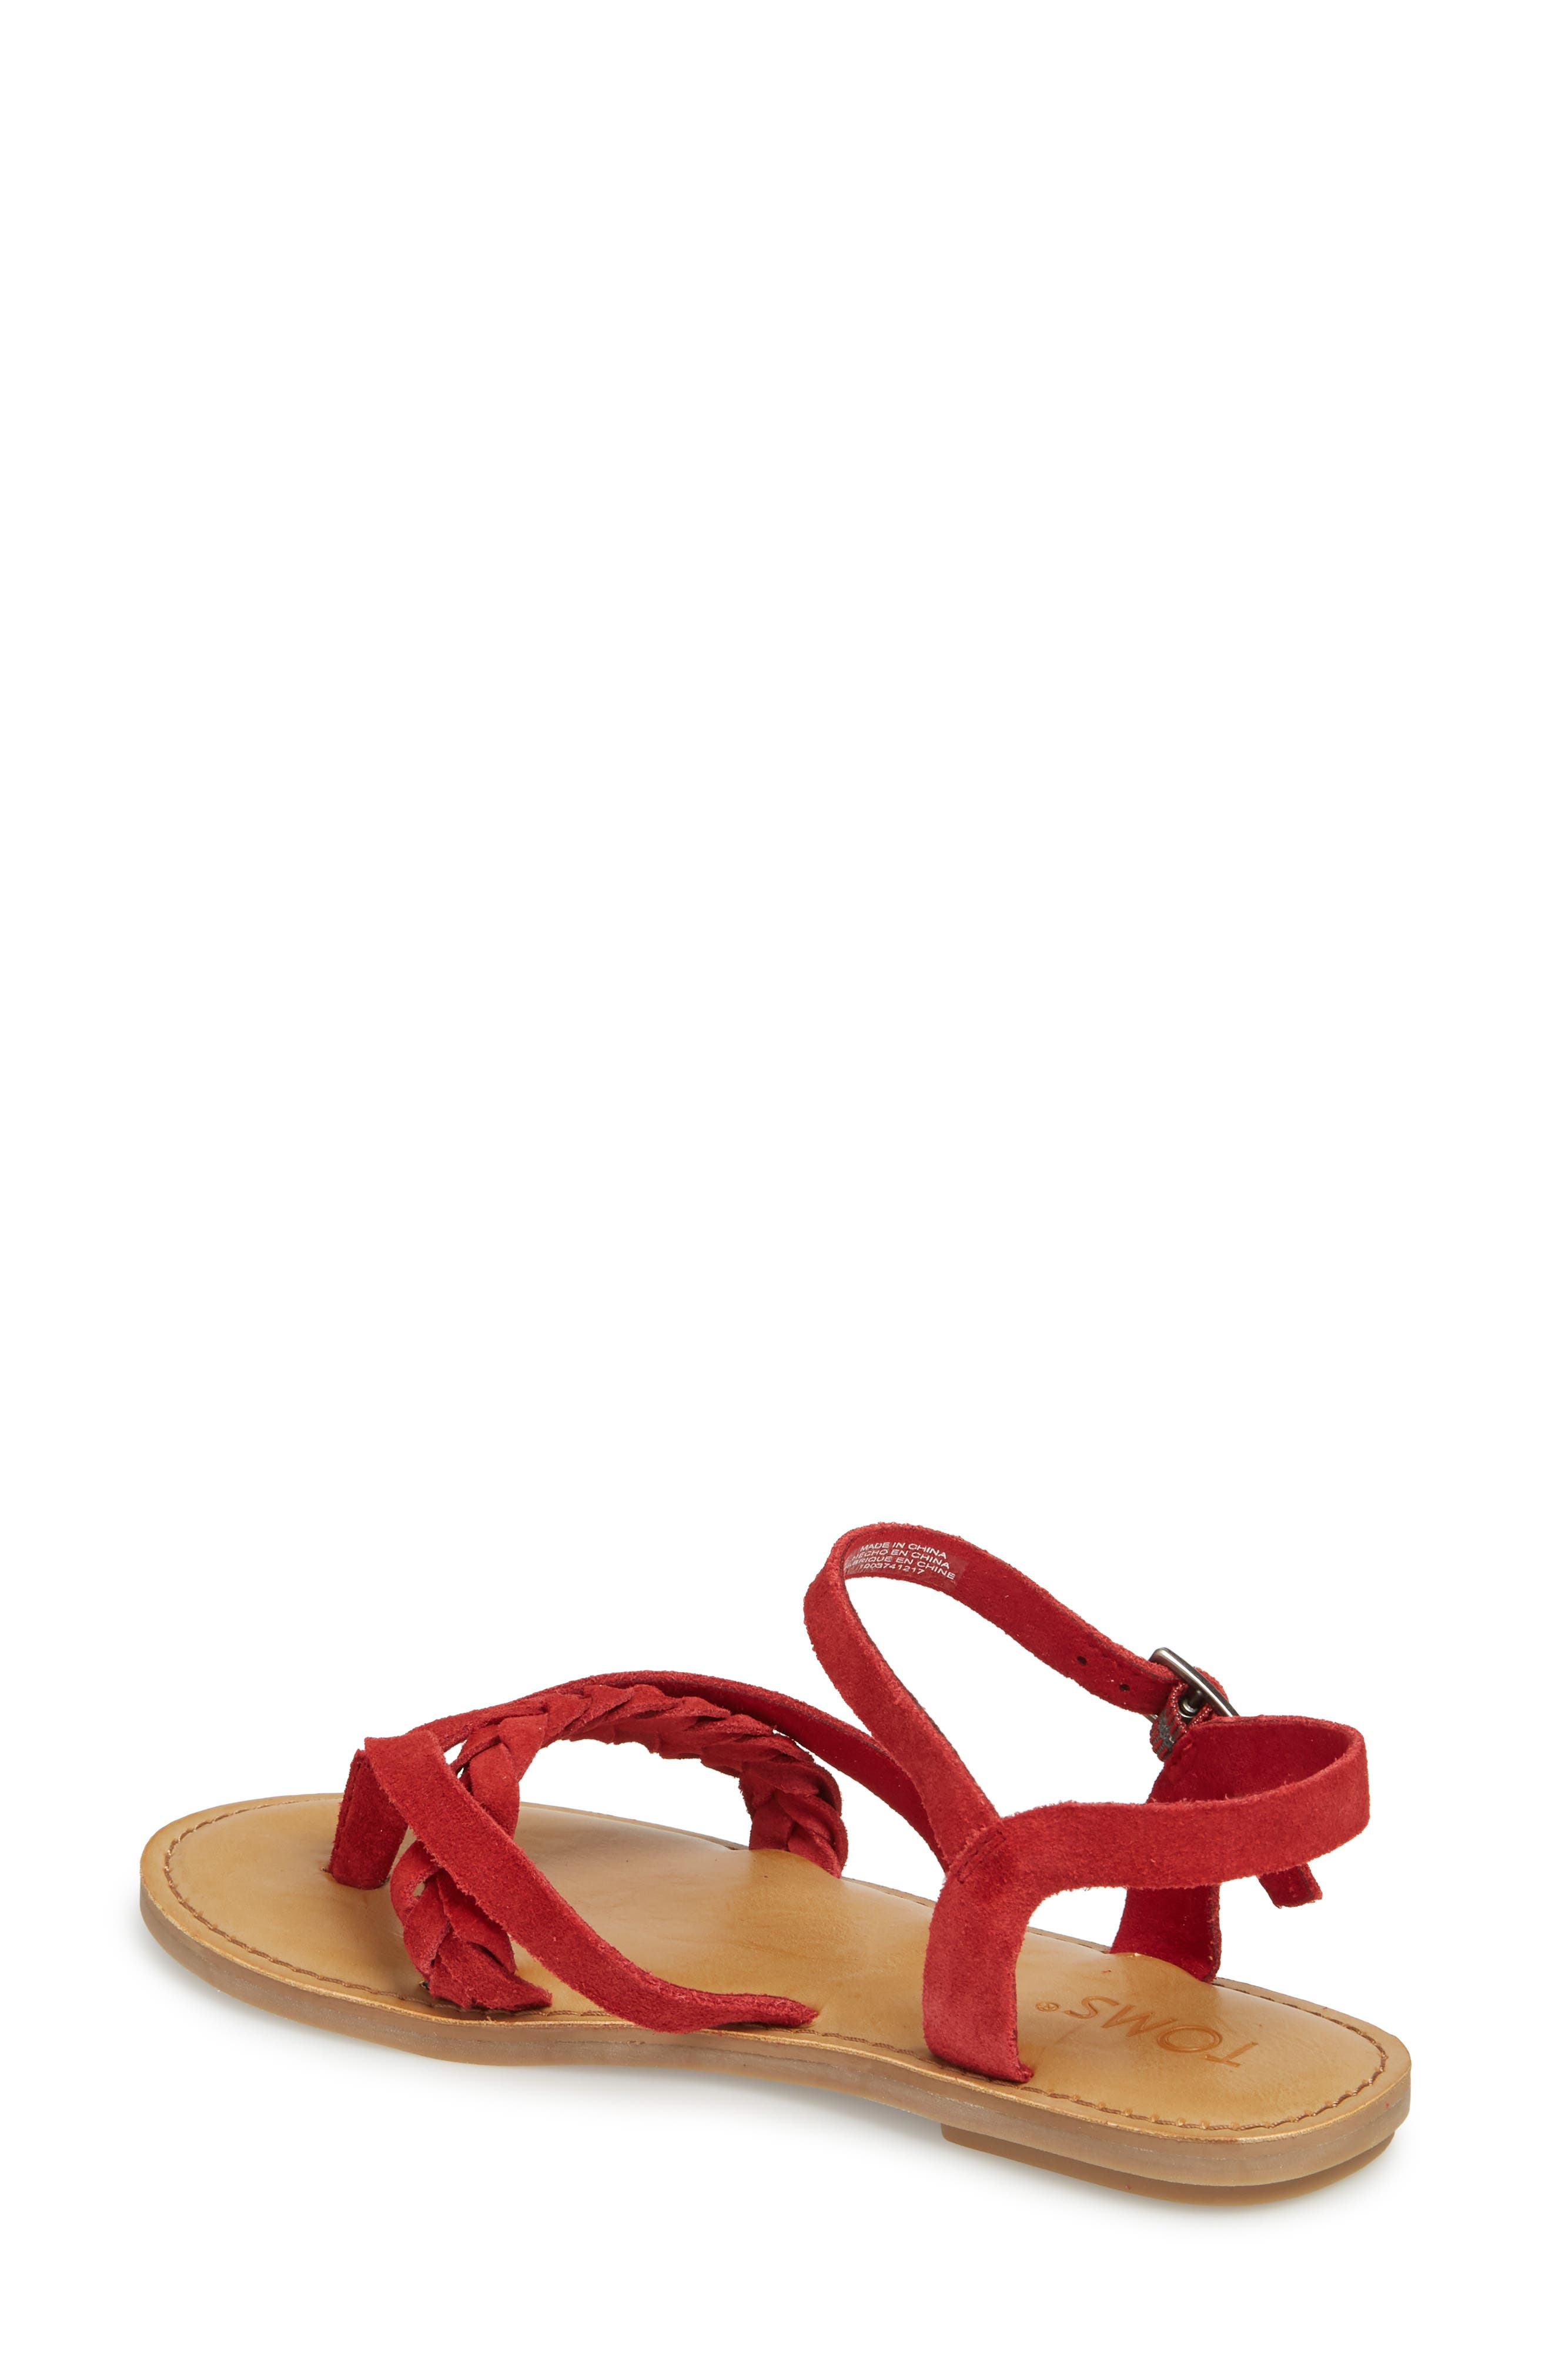 'Lexie' Sandal,                             Alternate thumbnail 14, color,